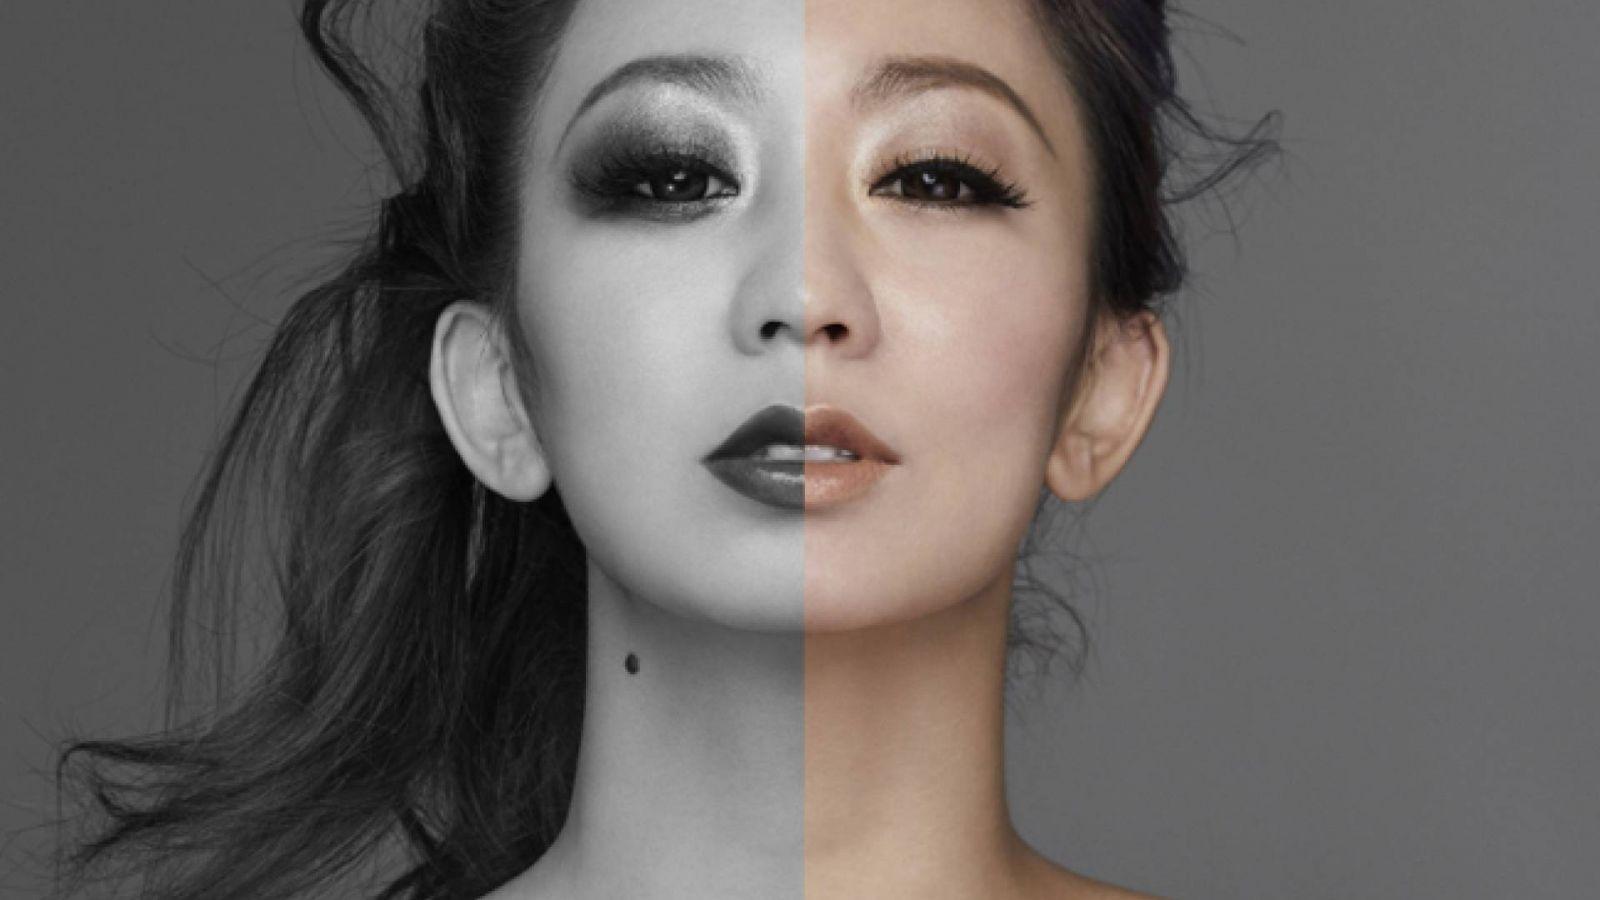 Koda Kumi anuncia dois novos álbuns © avex music creative Inc. All rights reserved.